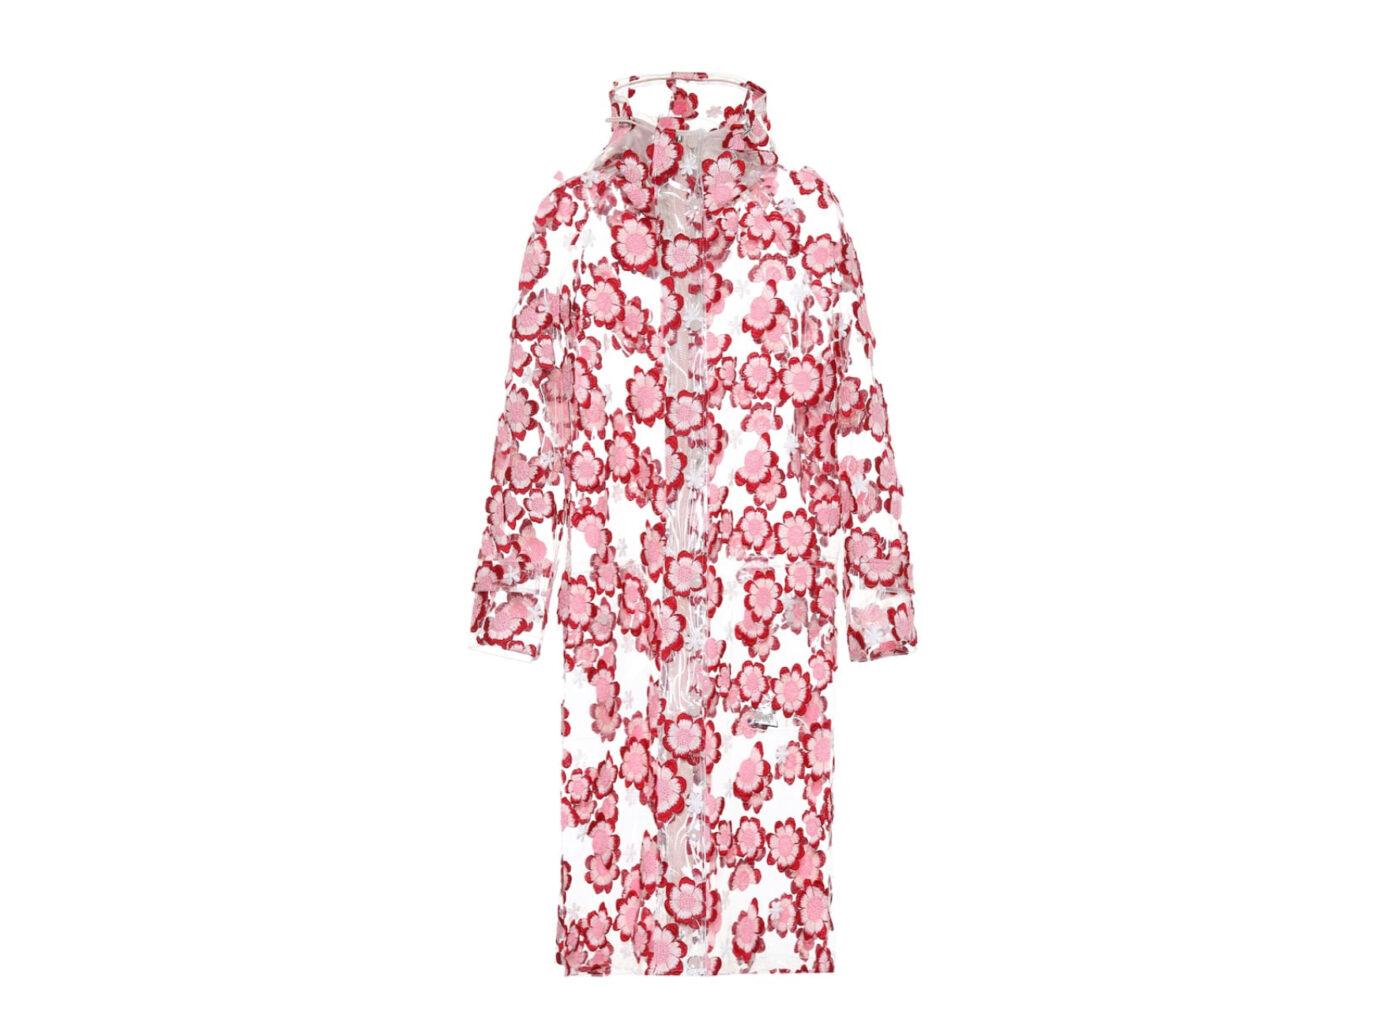 Moncler Genius Embroidered Raincoat